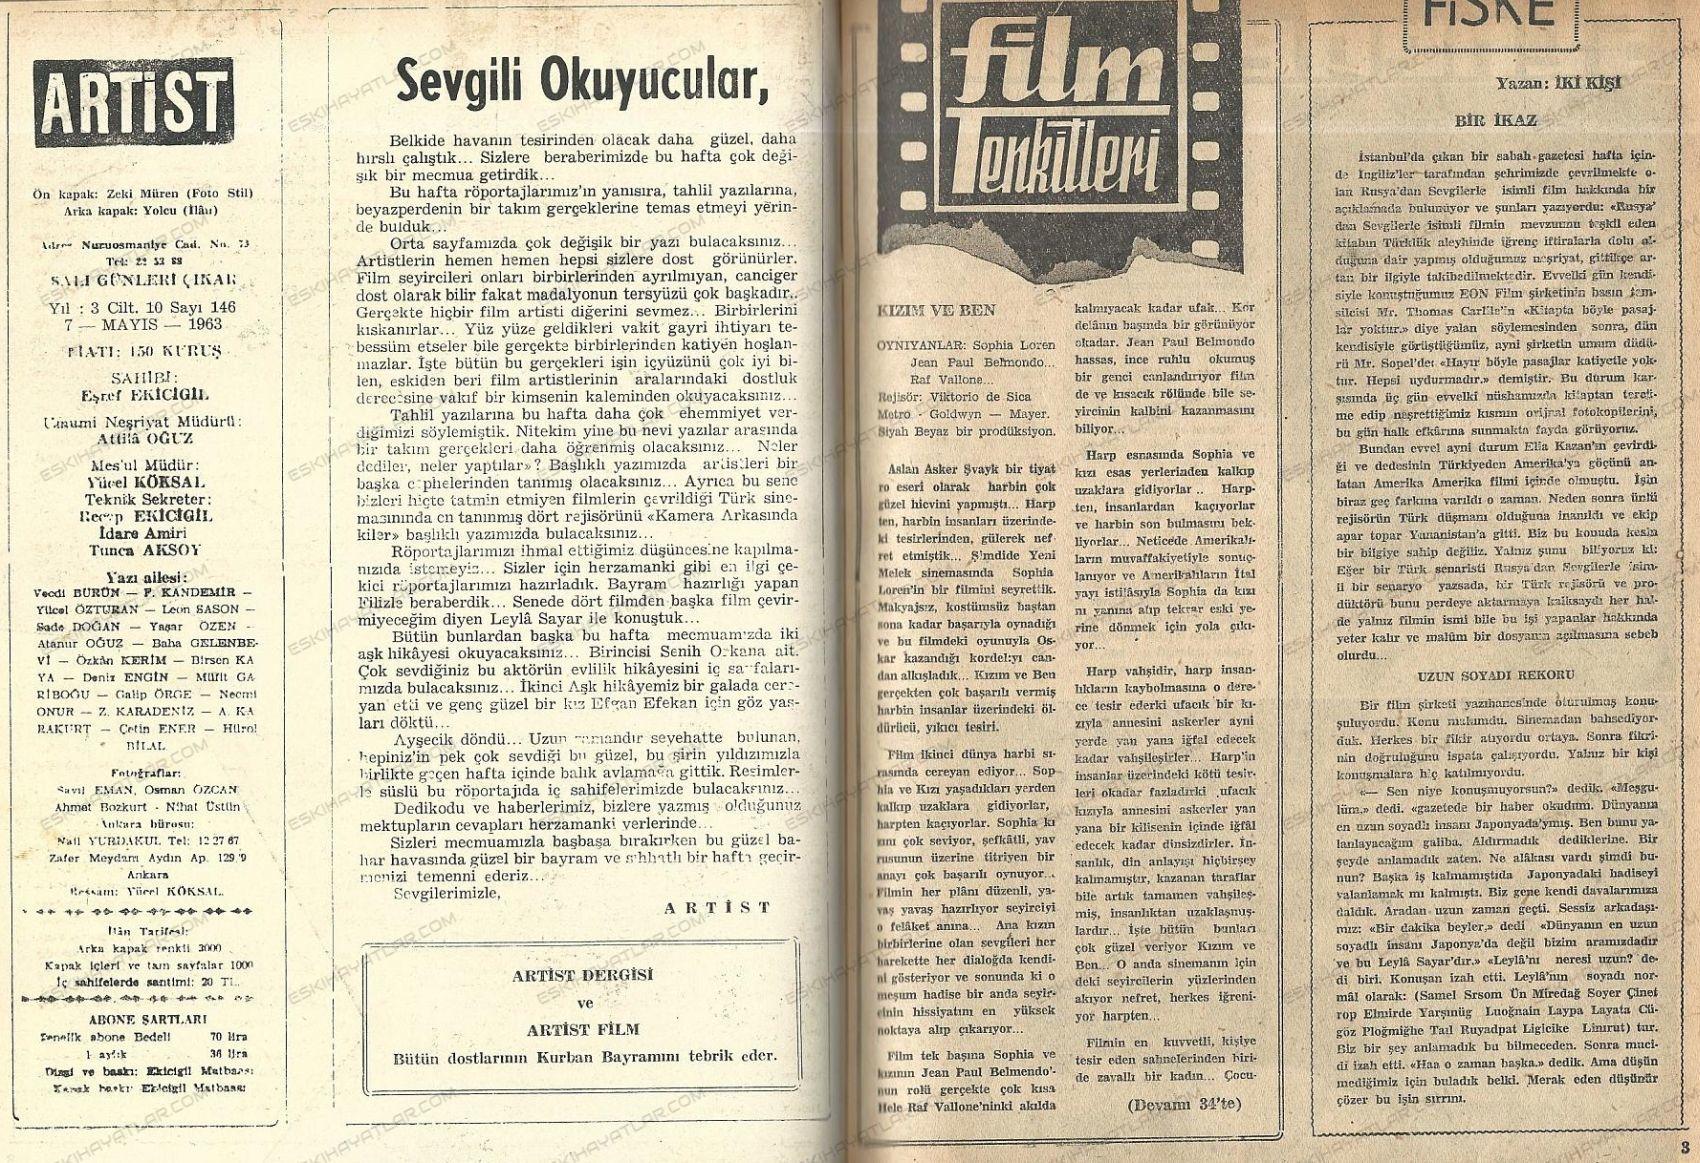 0339-efgan-efekan-ayhan-isik-muhterem-nur-1963-artist-dergisi-orhan-gunsiray-goksel-arsoy-neriman-koksal-ahmet-tarik-tekce (0)